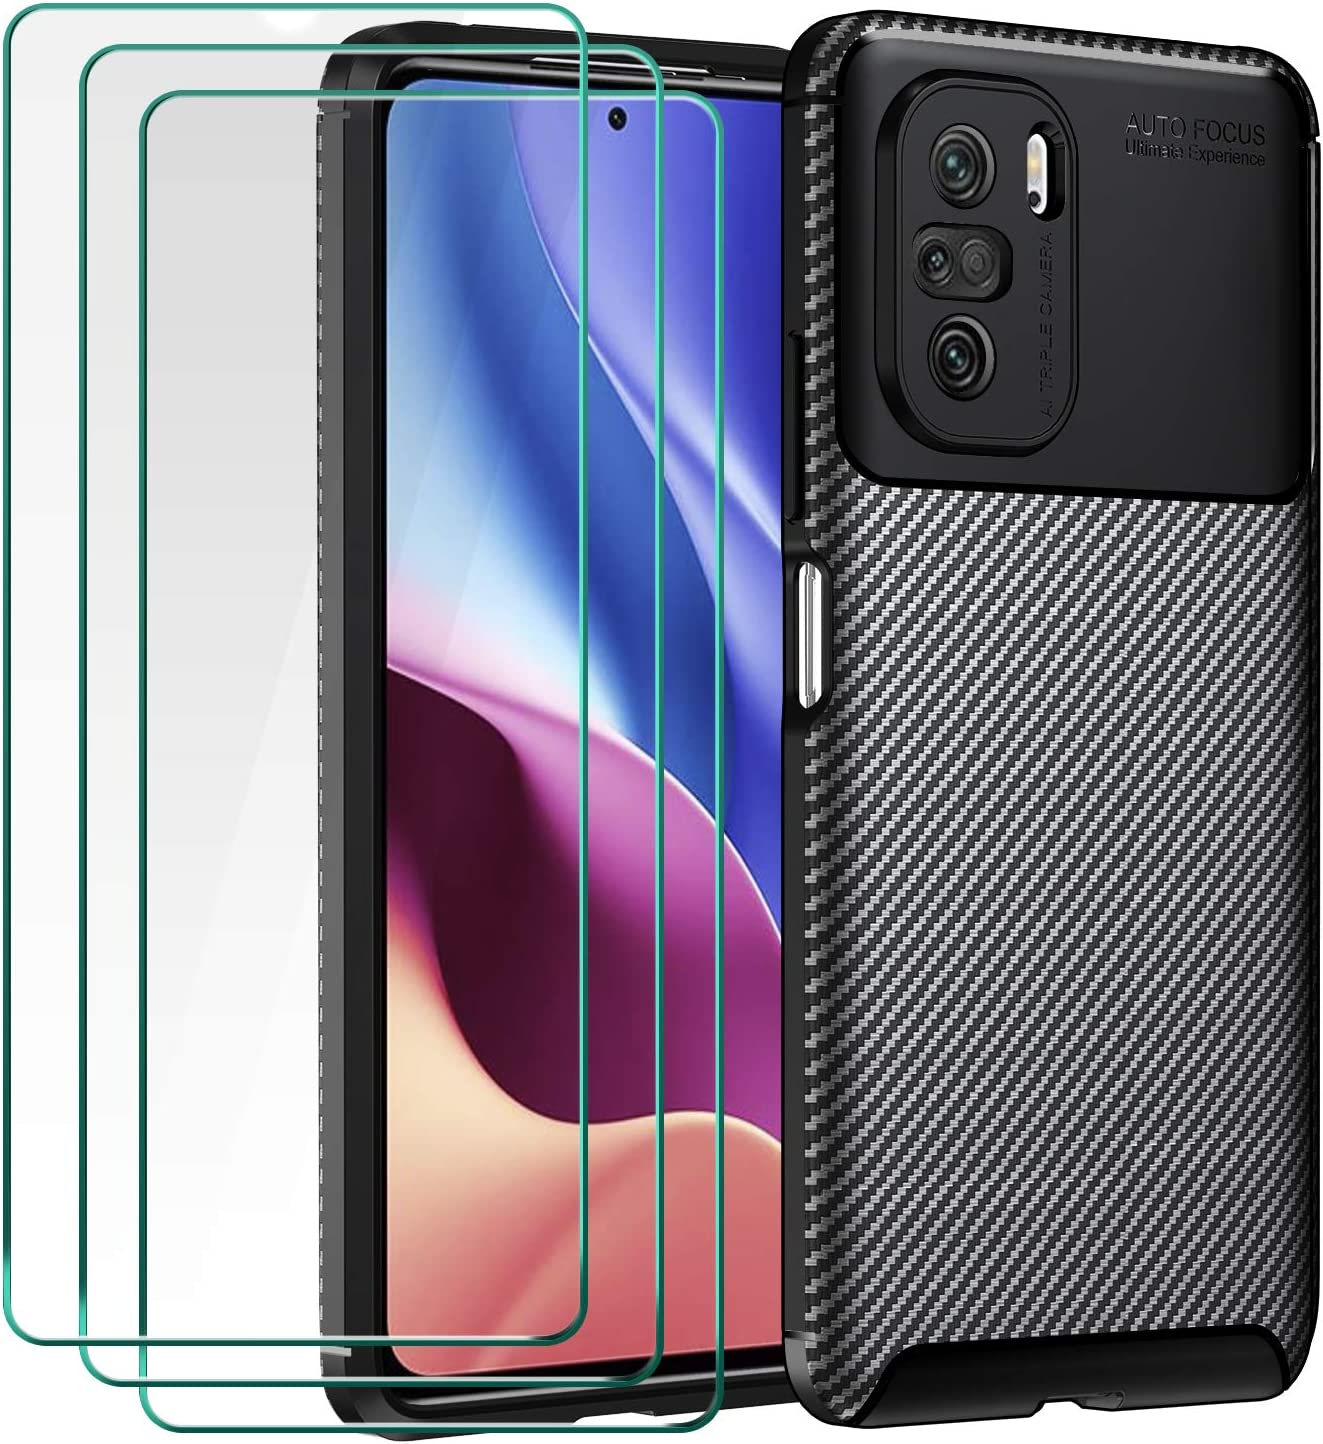 ivoler Funda para Xiaomi Poco F3 5G / Xiaomi Mi 11i, con 3 Unidades Cristal Templado, Fibra de Carbono Carcasa Protectora Antigolpes Negro, Suave TPU Silicona Caso Anti-Choques Case Cover